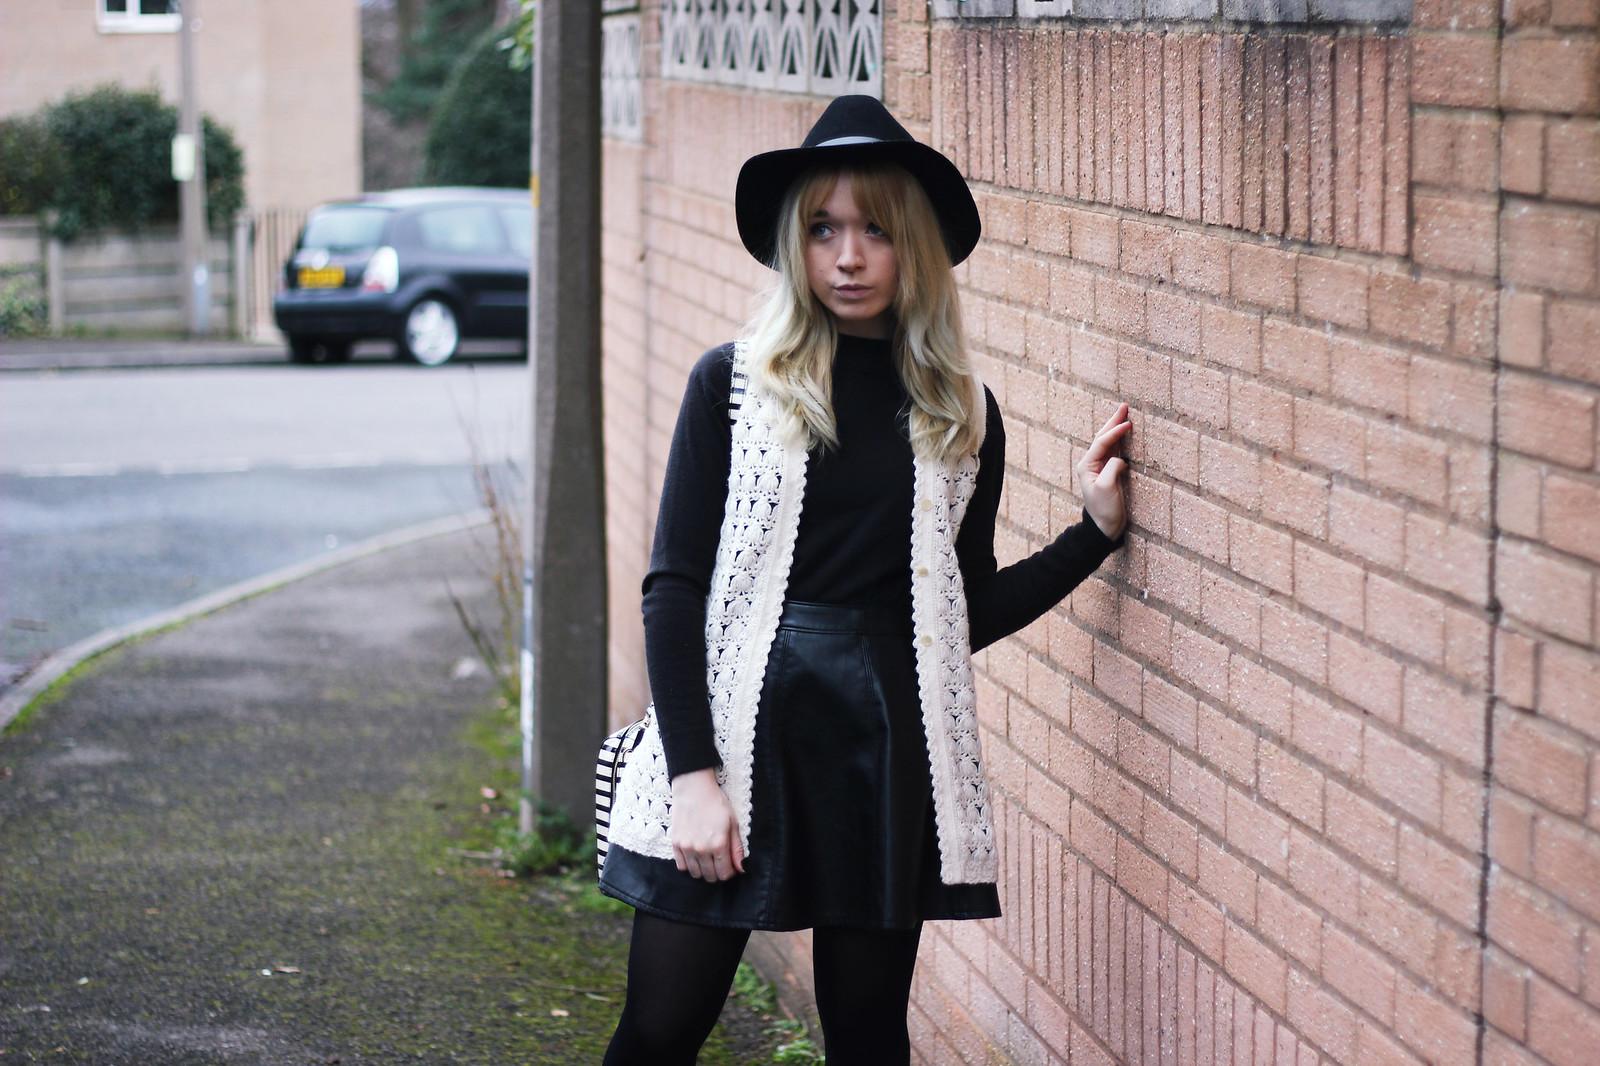 3-crochet-waistcoat-outfit, fashion-blogger-style, boho, mod